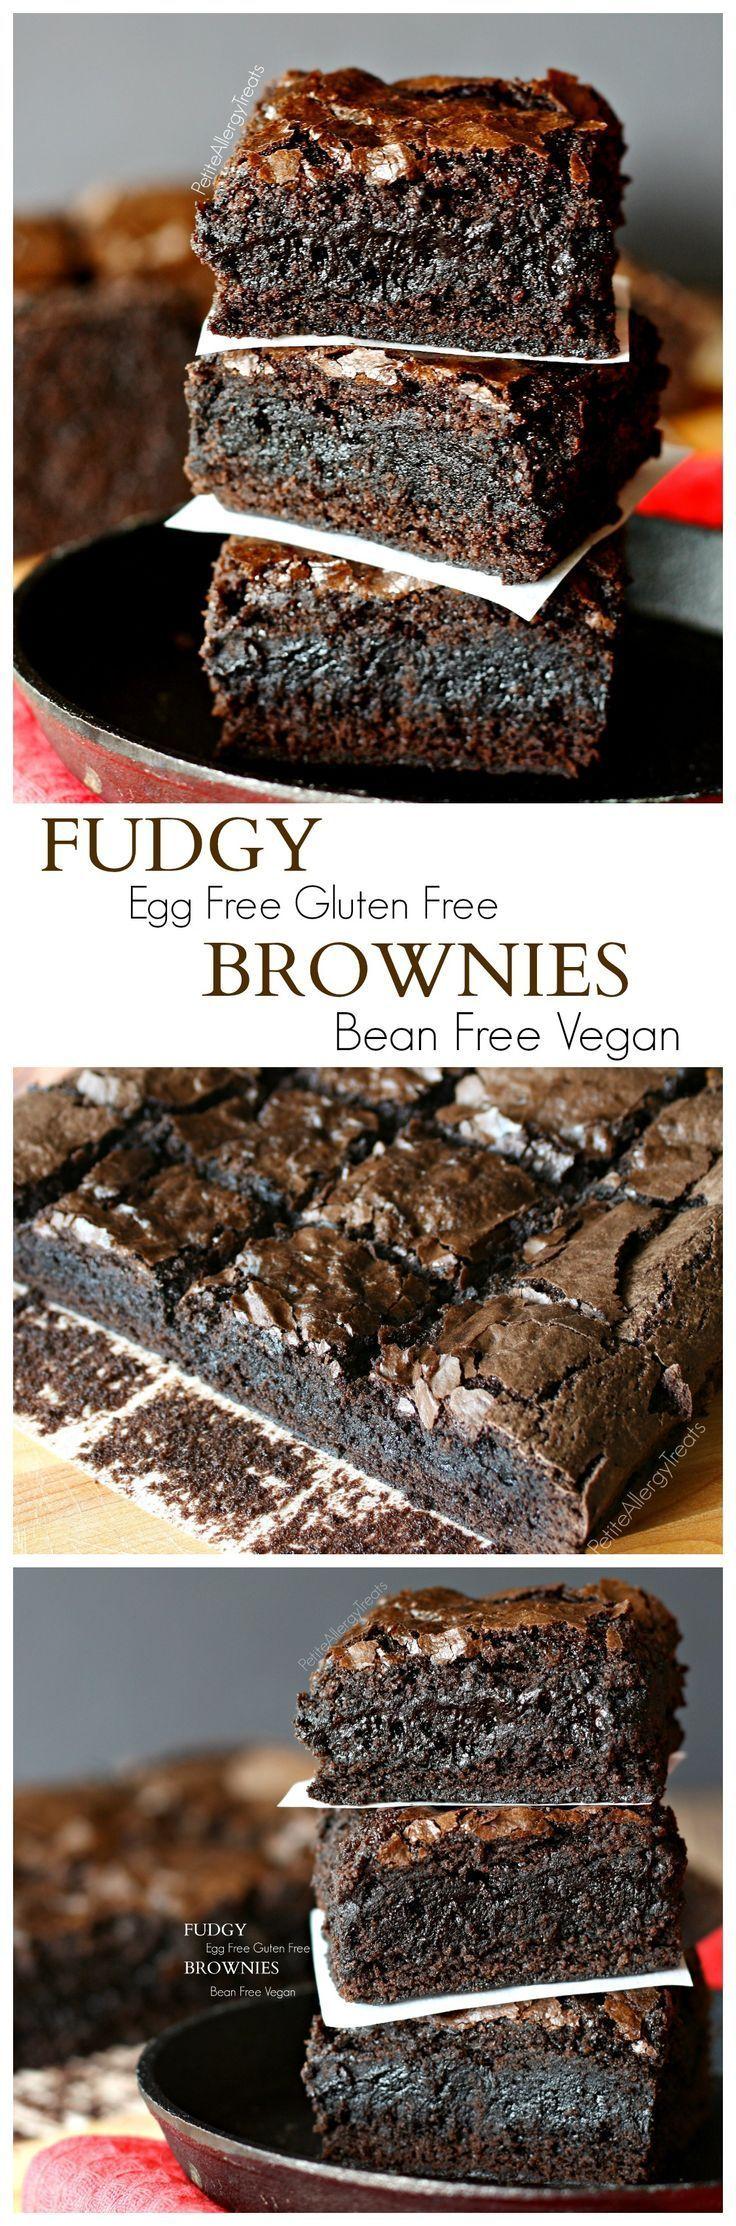 Fudgy Brownies (Gluten free Egg Free No Bean Vegan)- Decadent rich eggless brownie that is super fudgy!